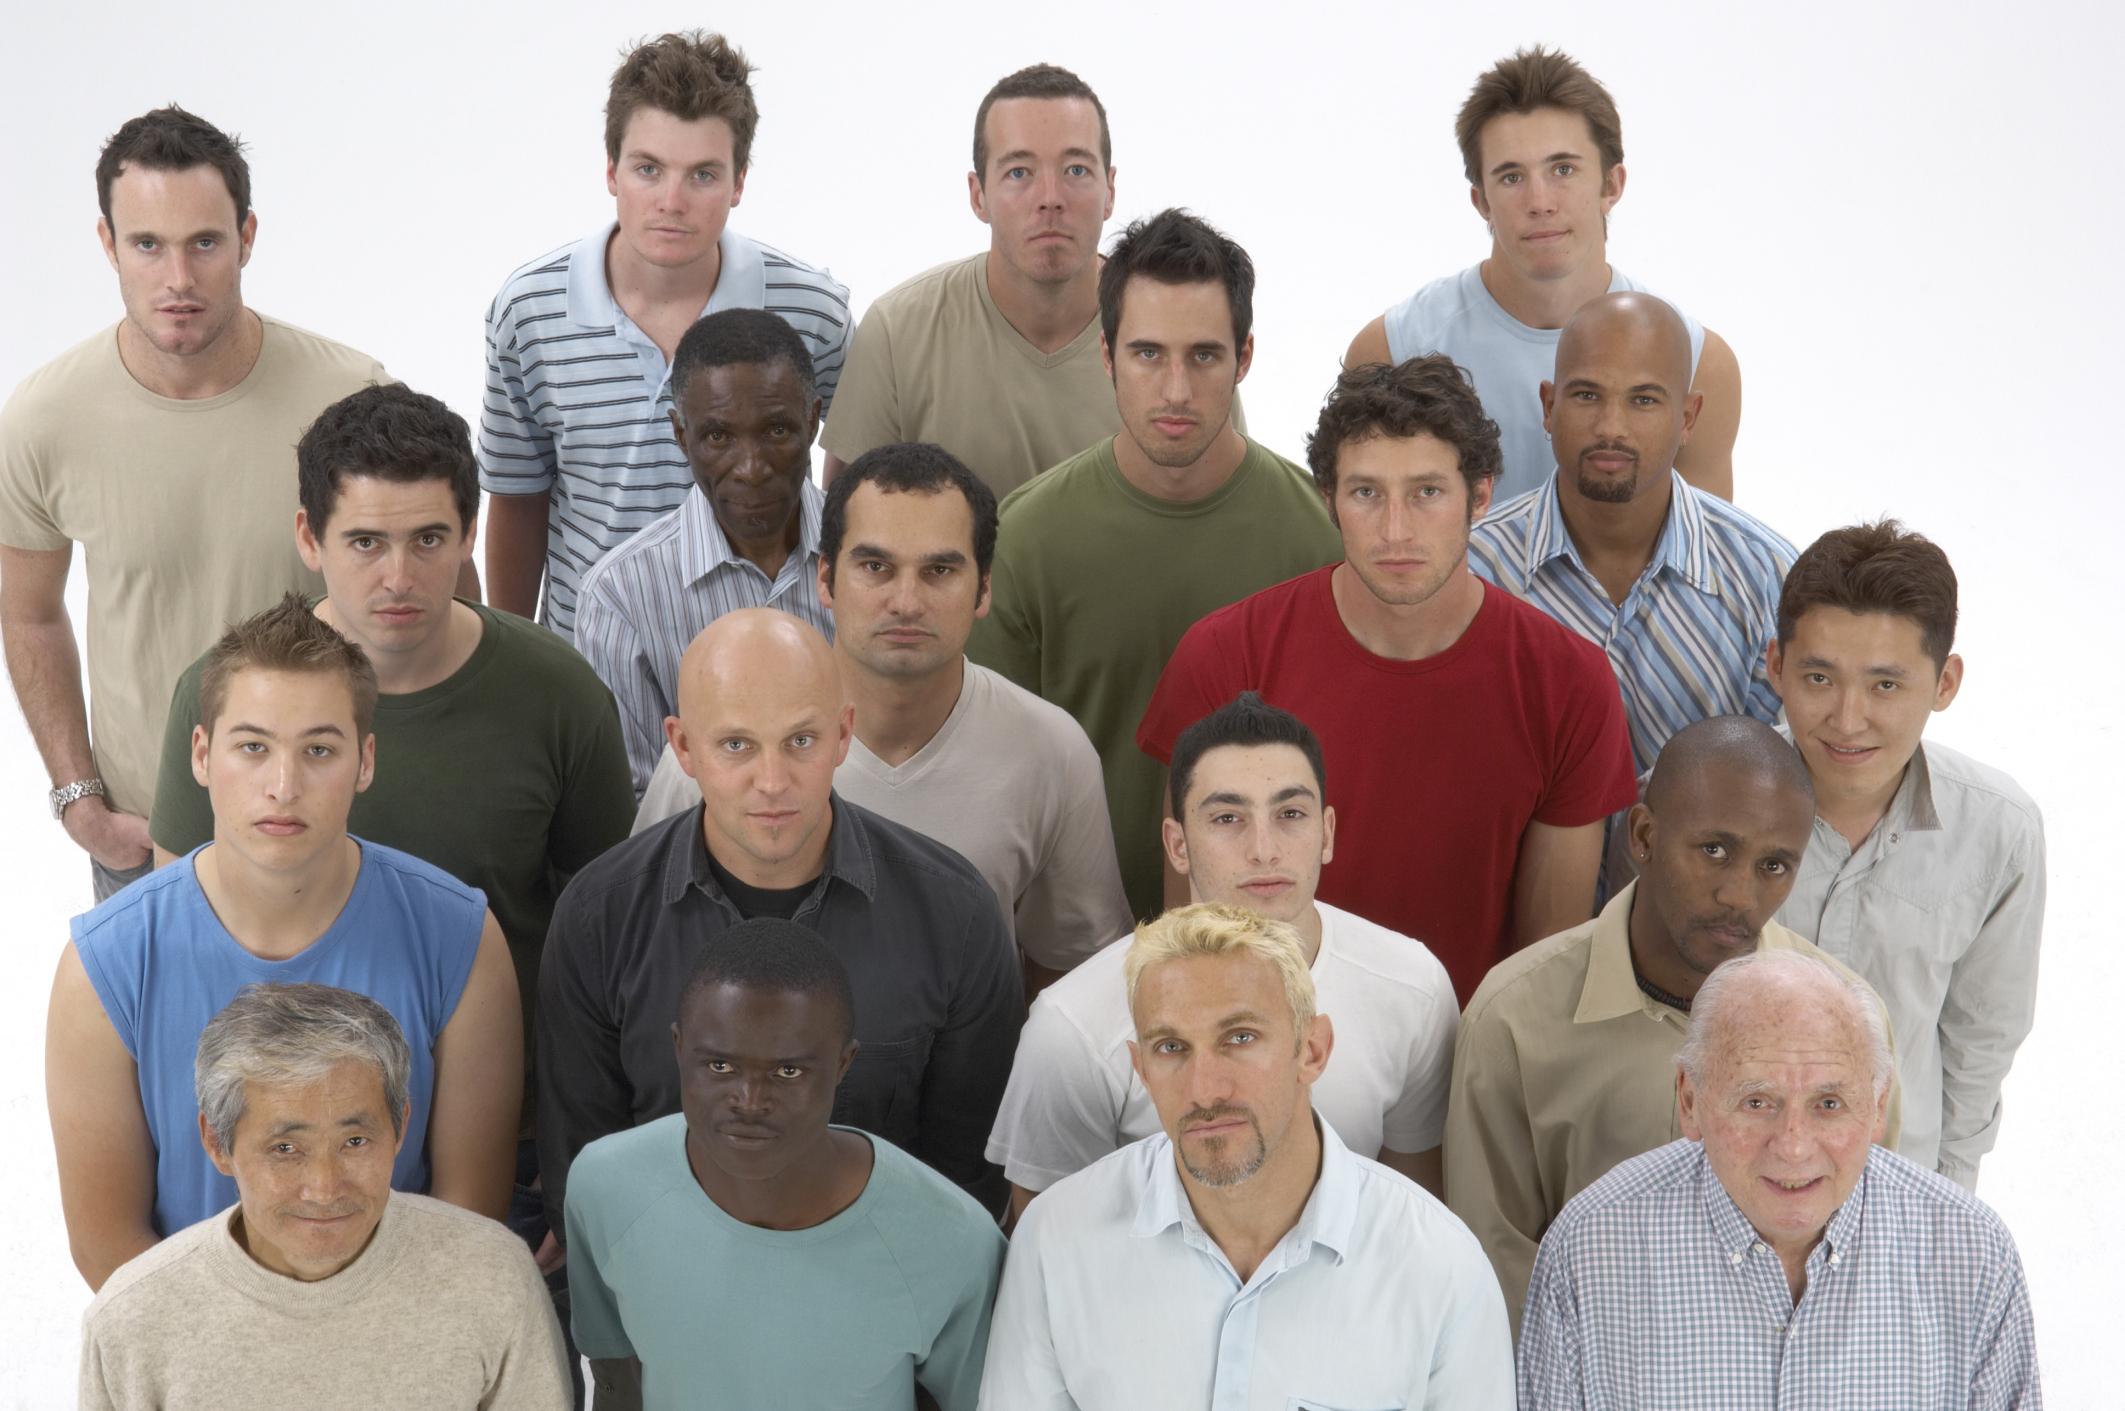 Adult man group